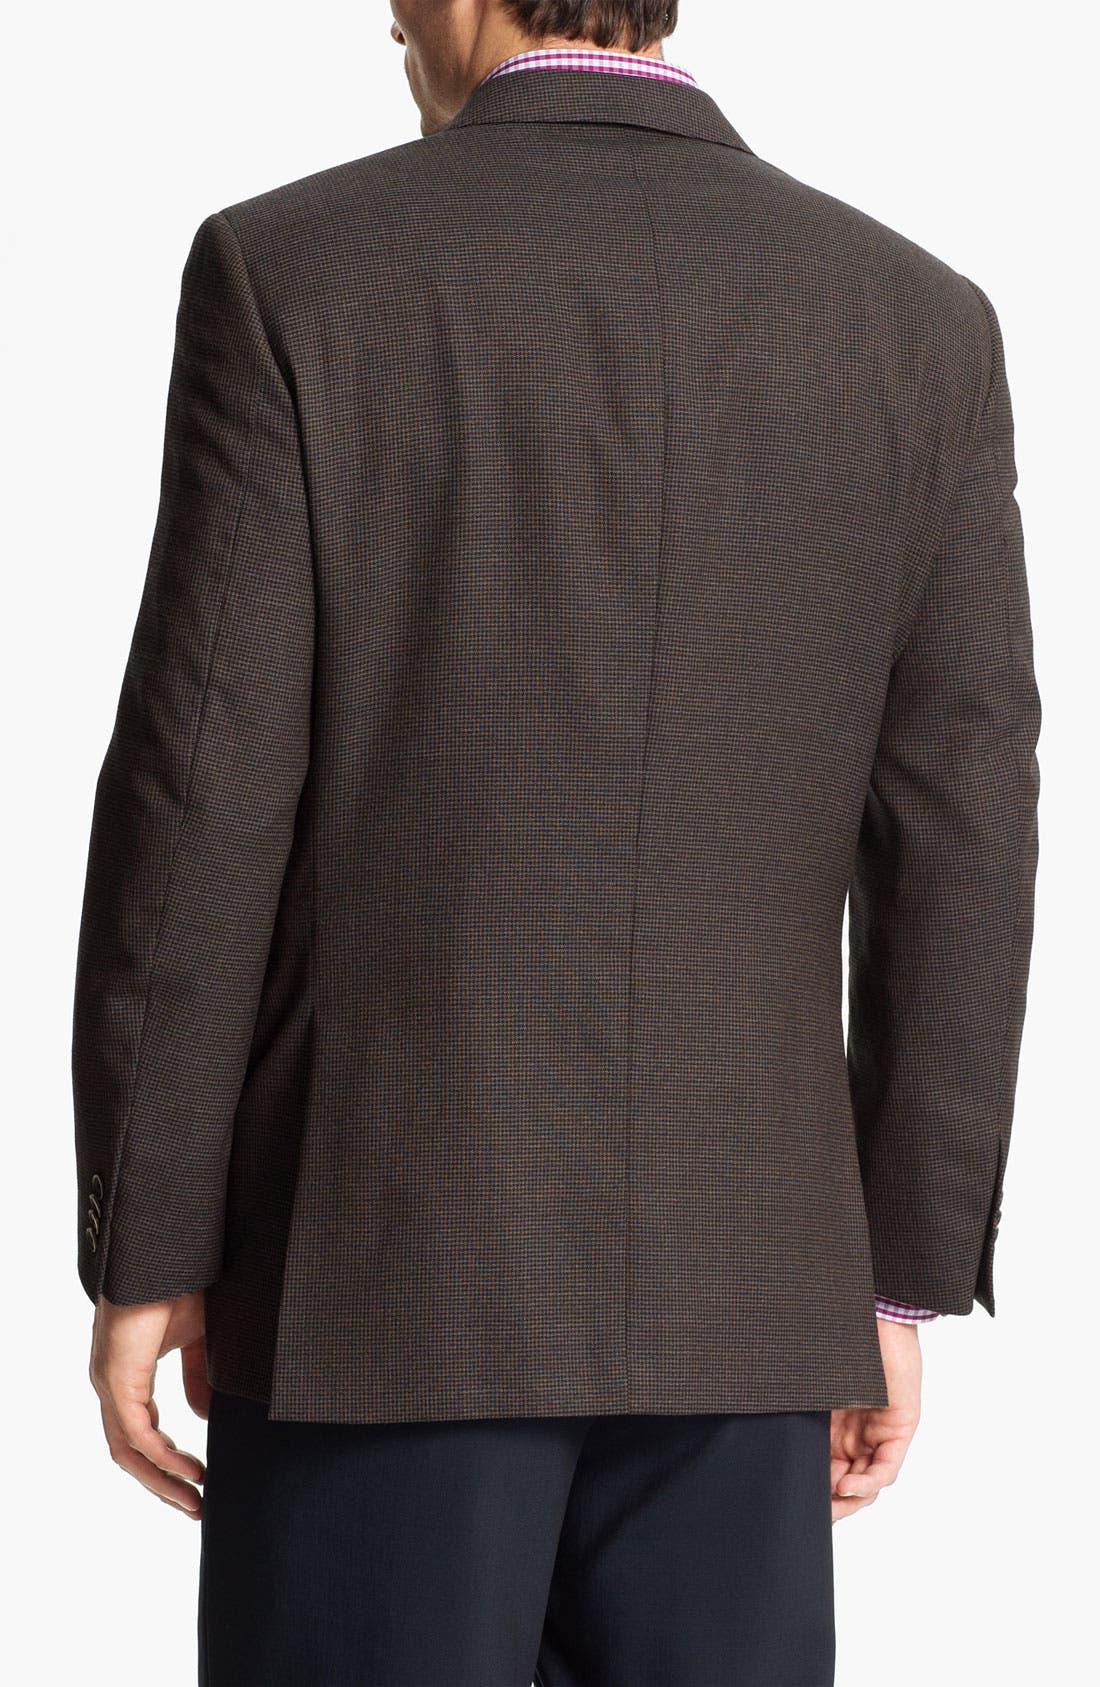 Alternate Image 2  - Peter Millar Houndstooth Sportcoat